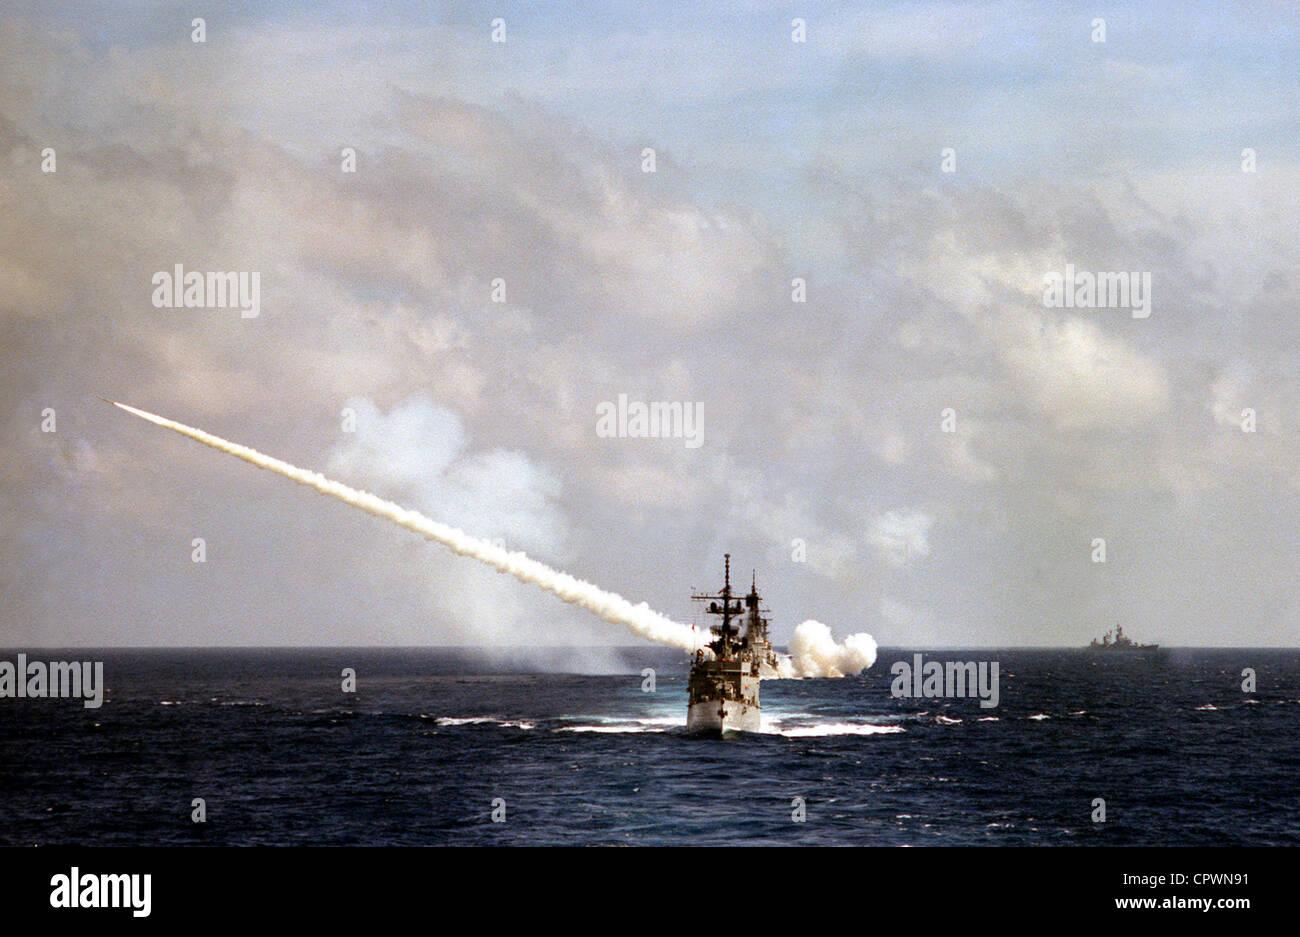 US NAVY USN USS FARRAGUT GUIDED MISSLE DESTROYER 8X12 PHOTOGRAPH DDG-37